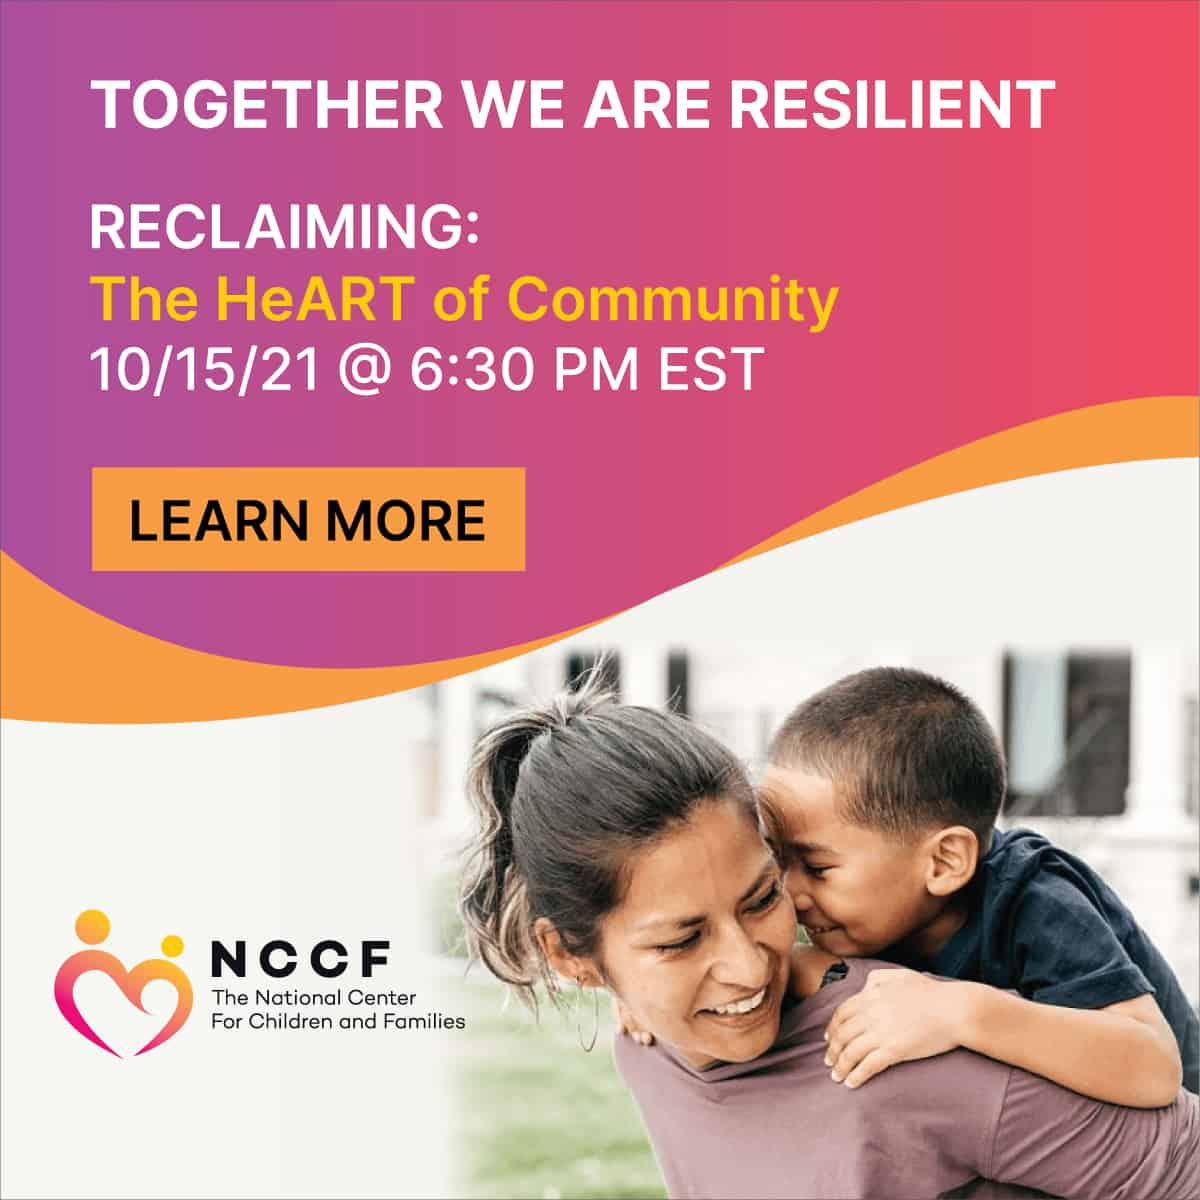 https://nccf-cares.org/wp-content/uploads/2021/09/1200-x-1200-Facebook-1.jpg